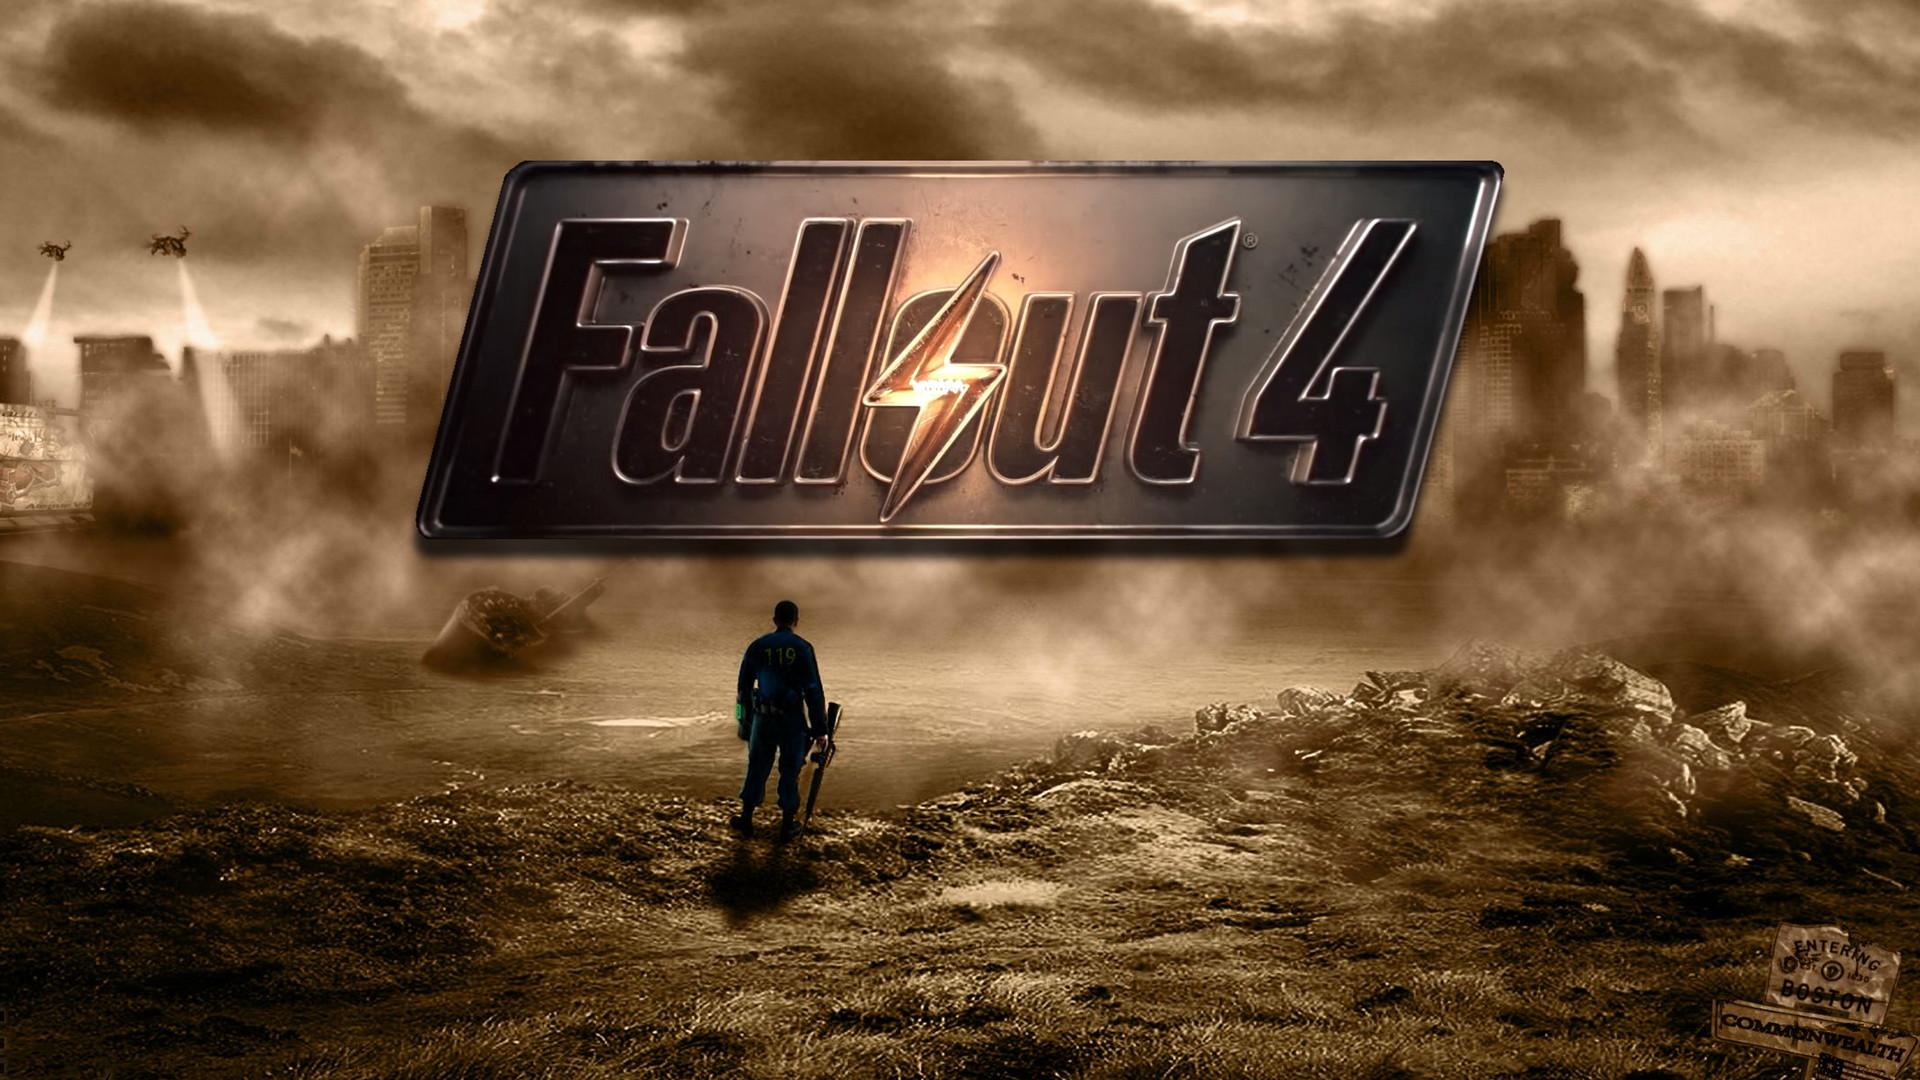 Fallout 4 Wallpaper HD Resolution B7VB5